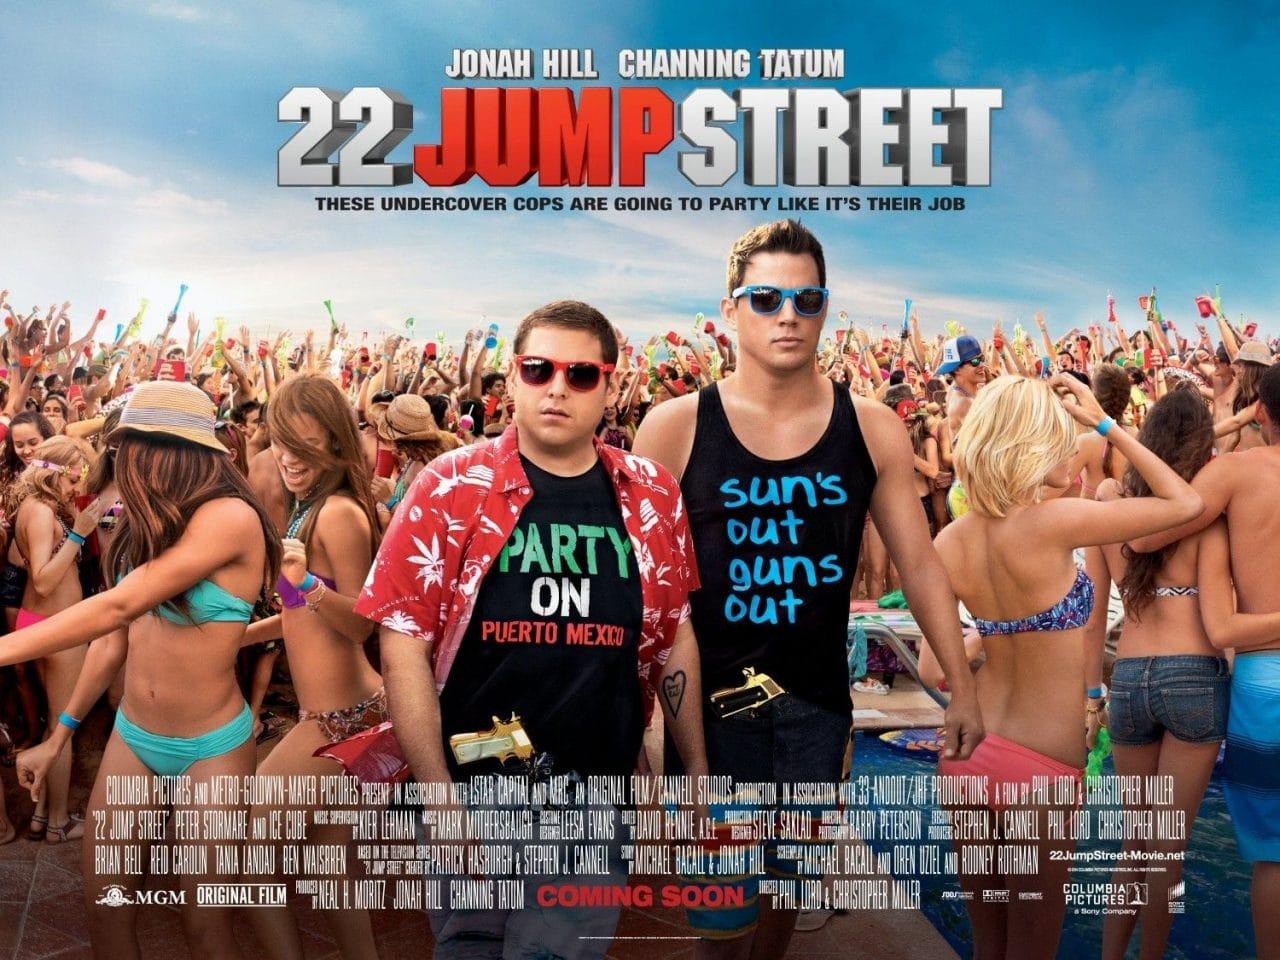 22_jump_street_affiche